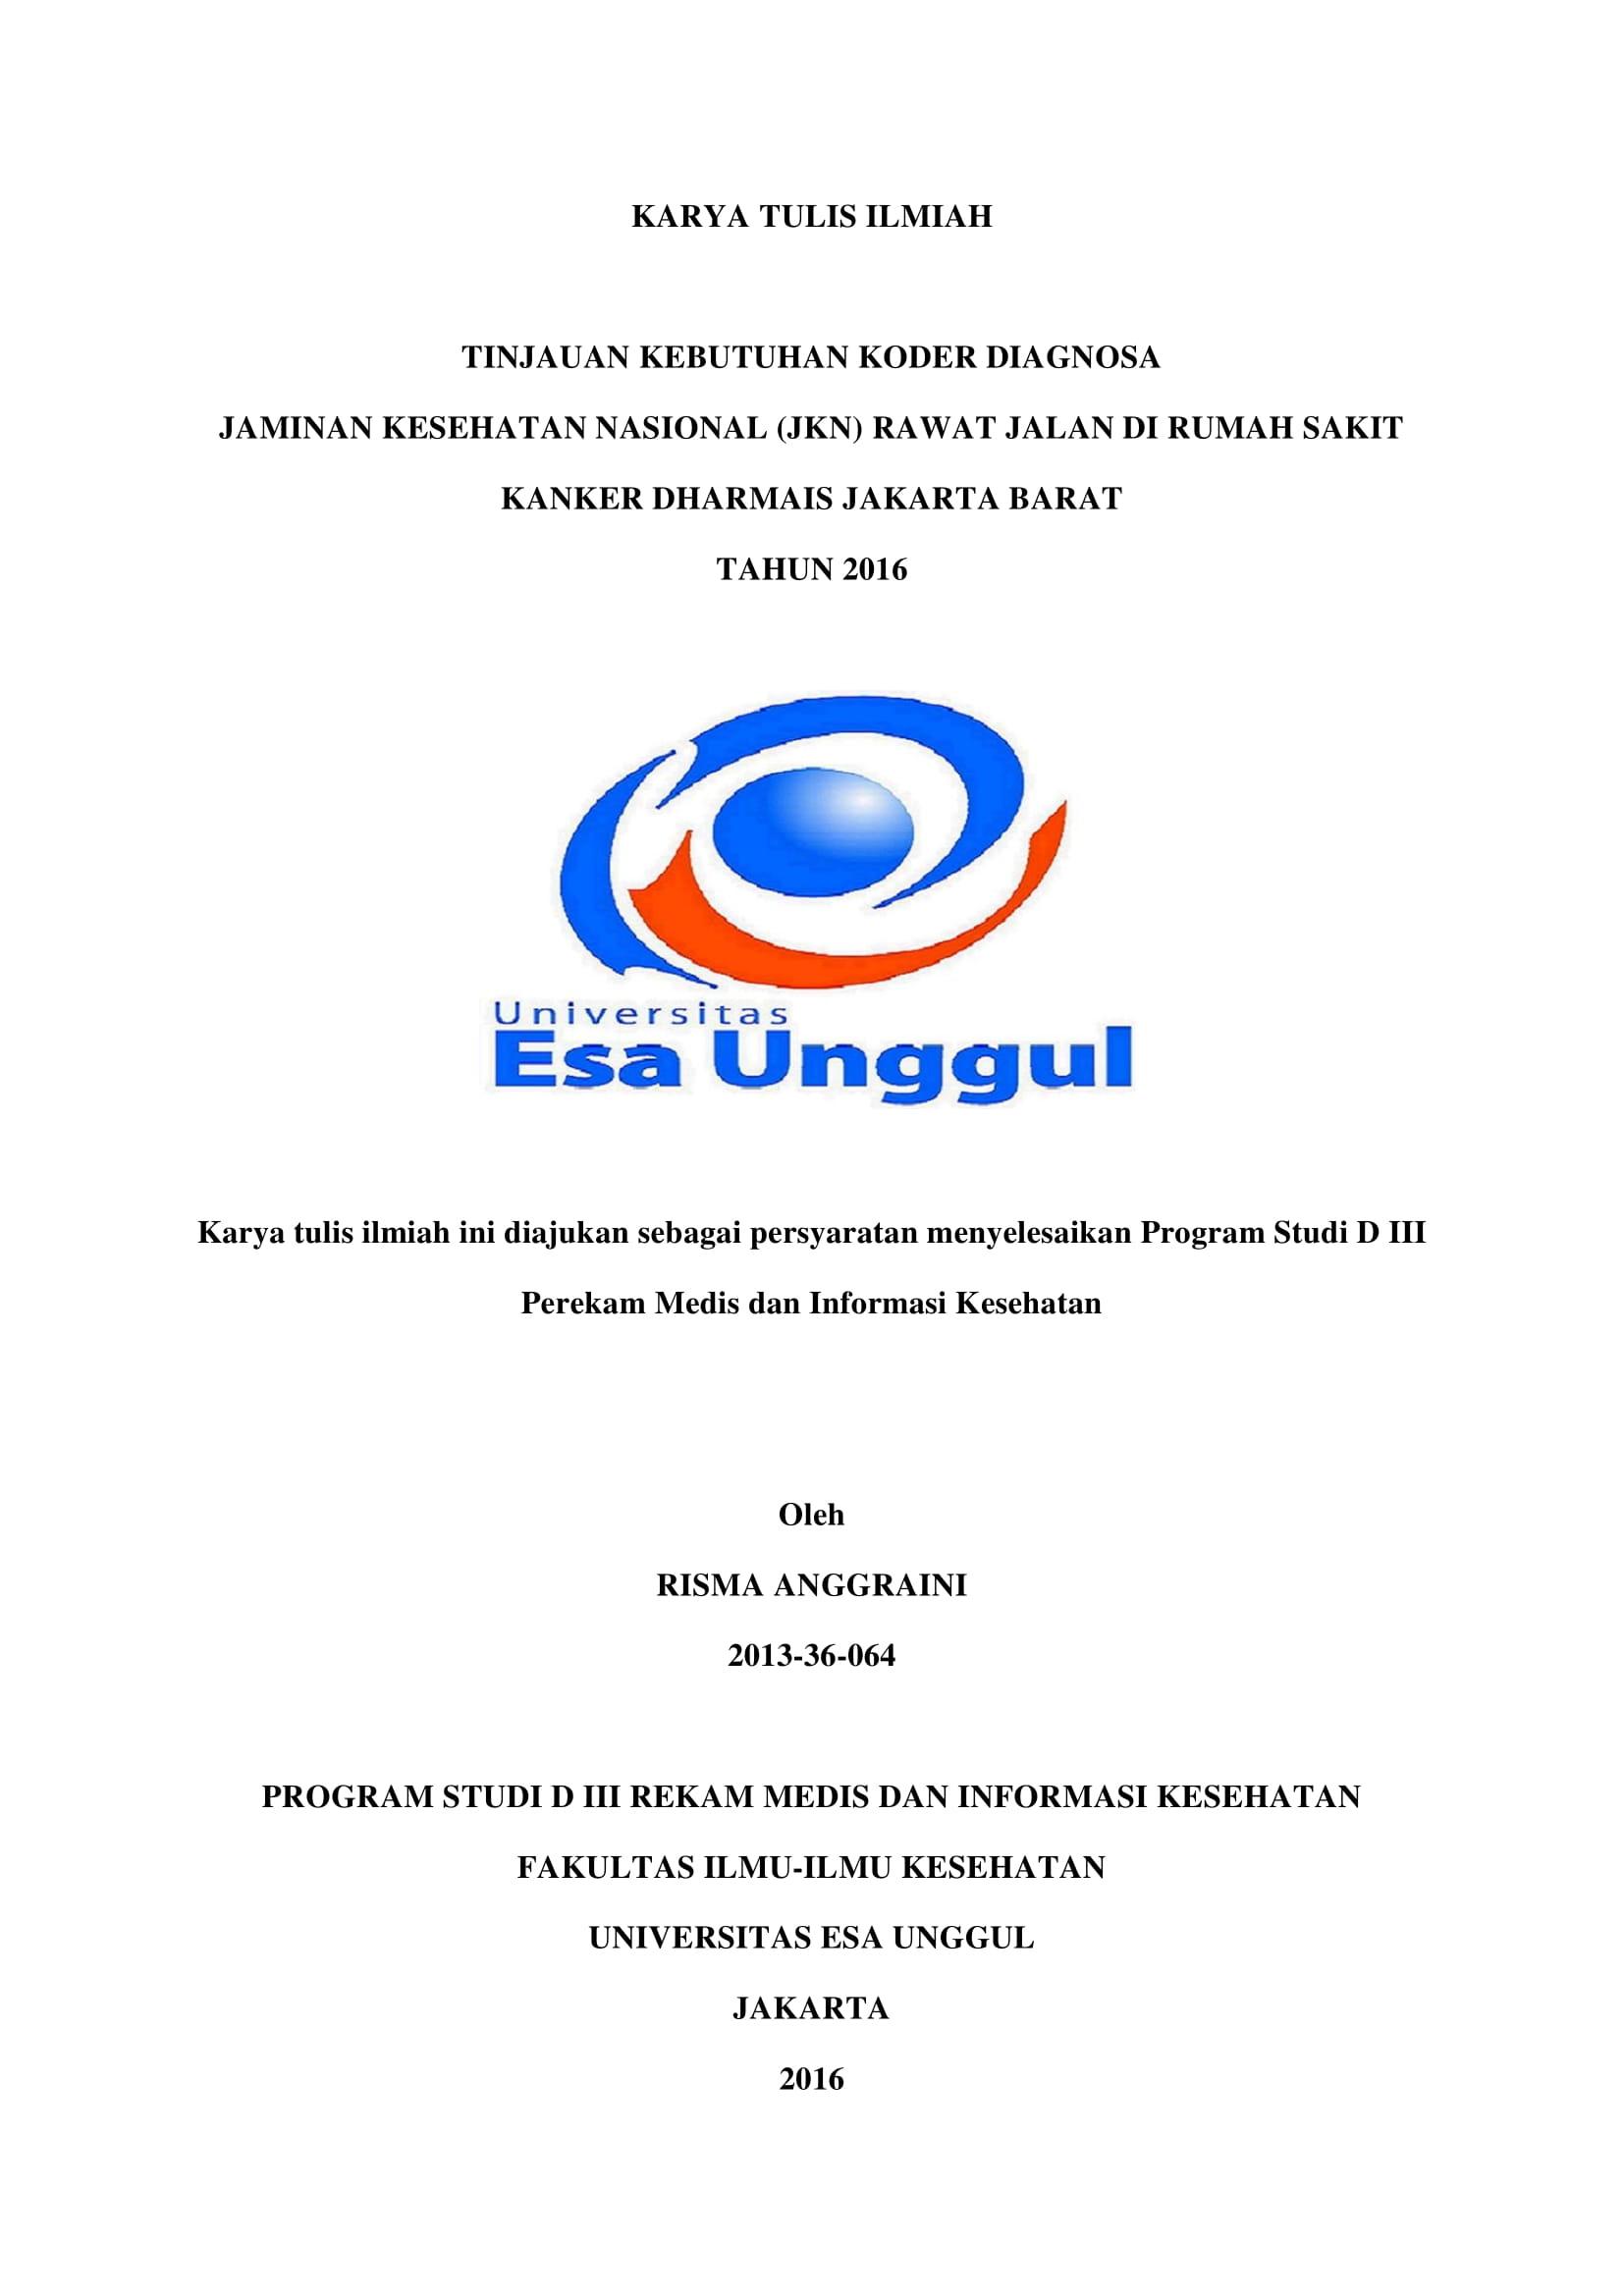 Tinjauan Kebutuhan Koder Diagnosa Jaminan Kesehatan Nasional (JKN) Rawat Jalan Di Rumah Sakit Kanker Dharmais Jakarta Barat Tahun 2016